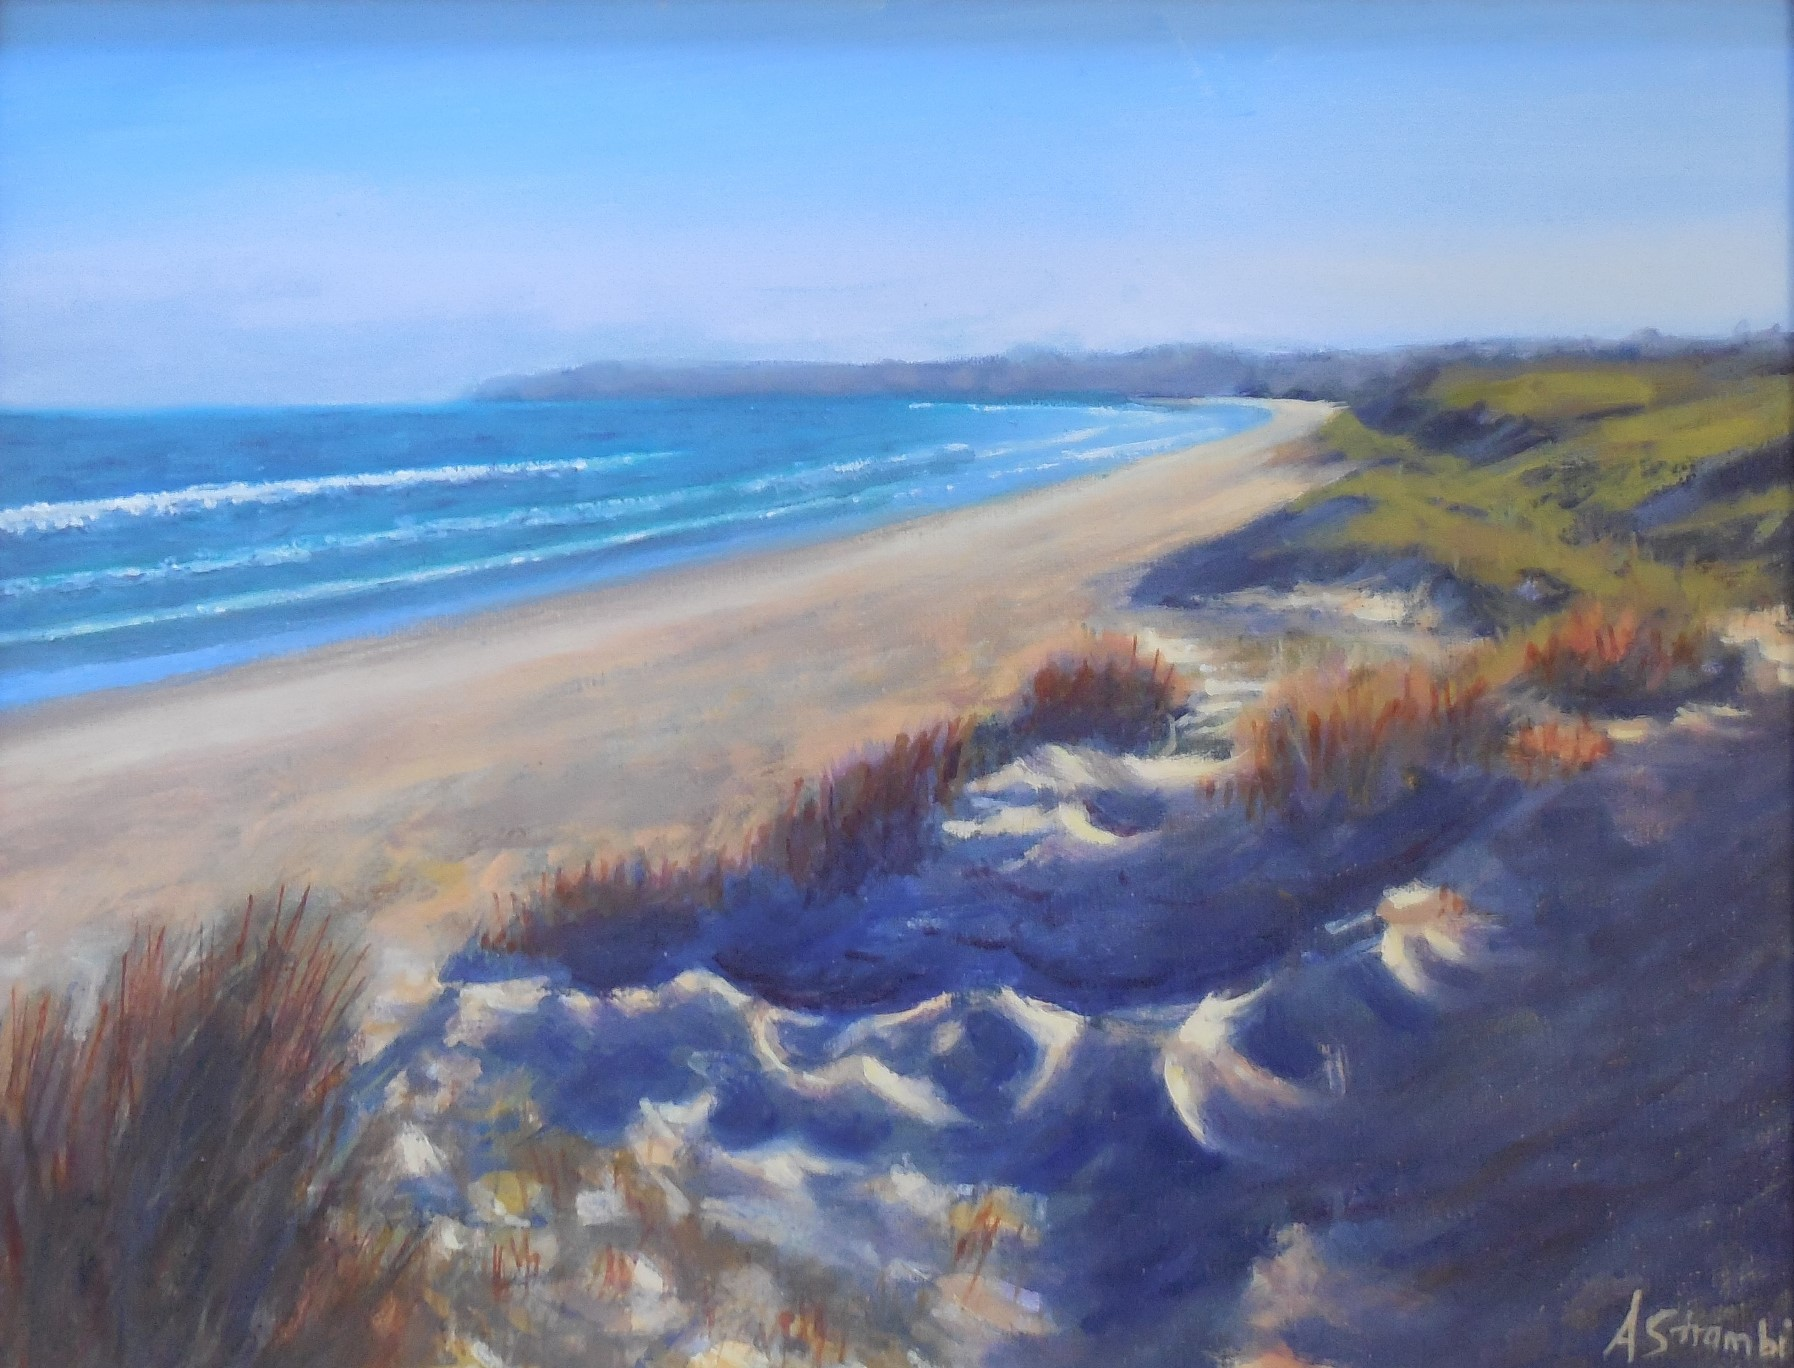 dune shadows final 15apr